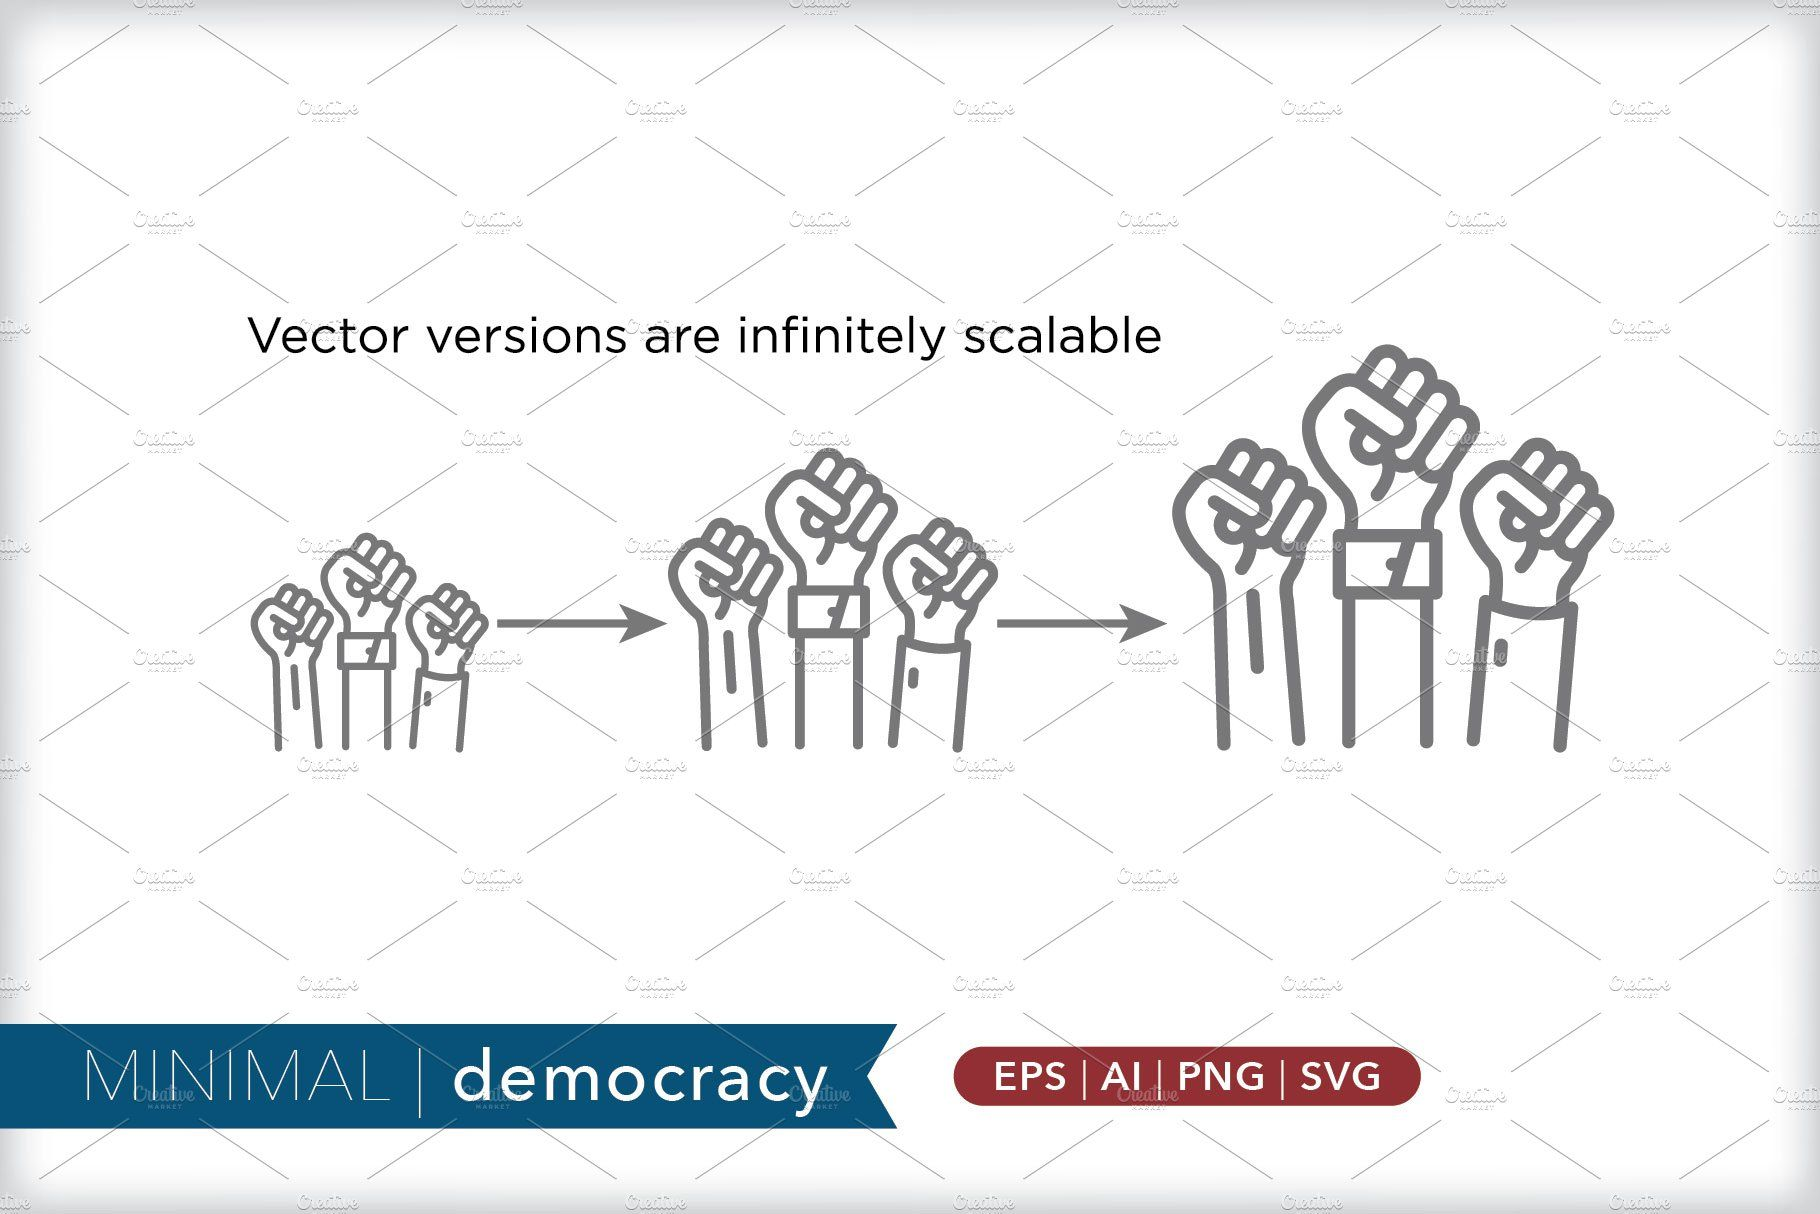 Minimal democracy icons Icon, Social media images